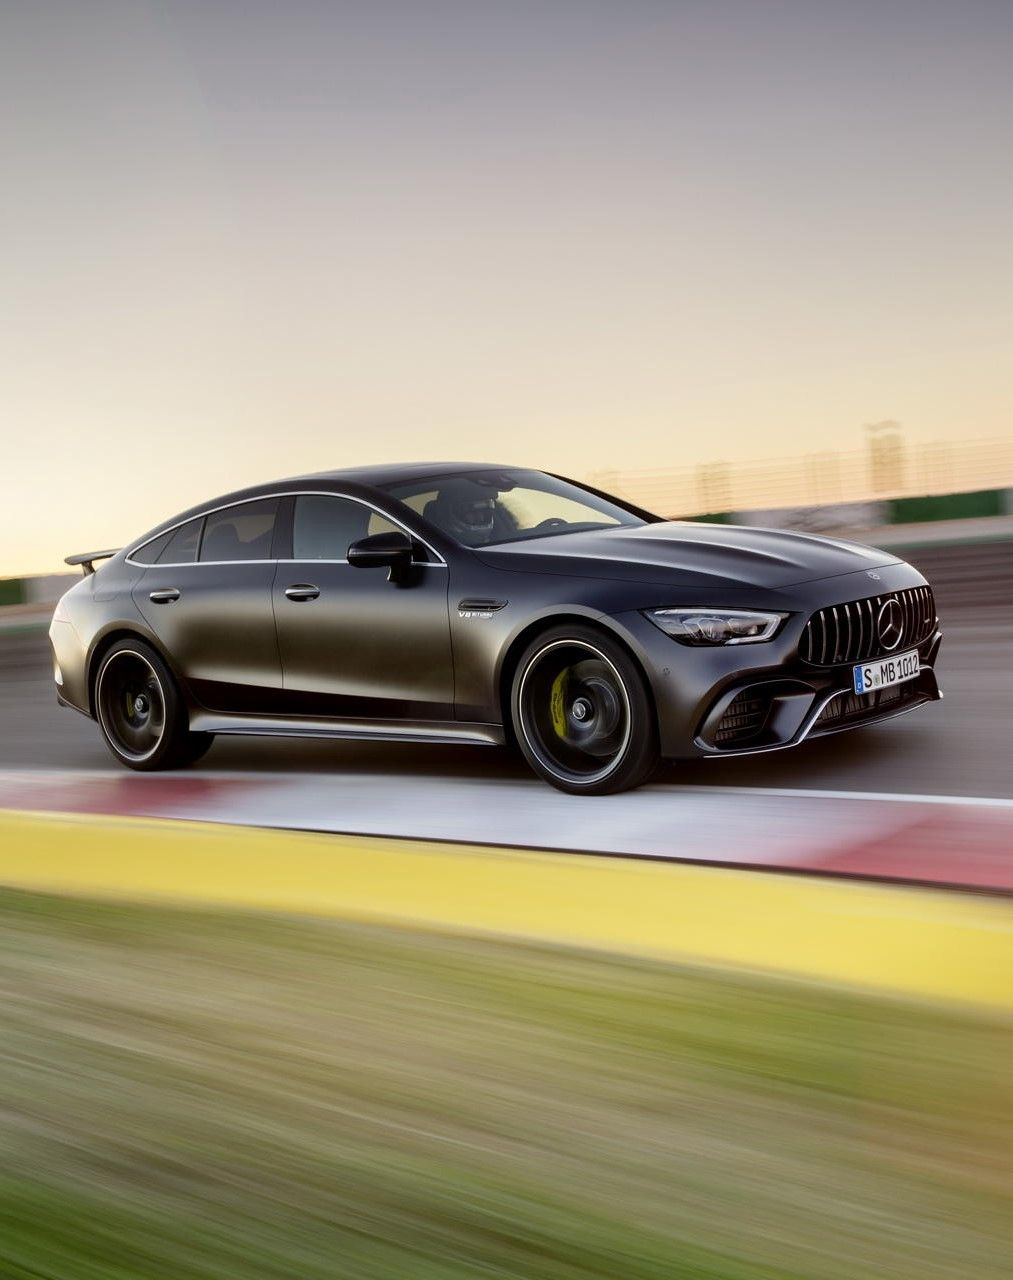 The Man Magazine 2019 Mercedes Amg Gt 4 Door Coupe Mercedes Amg Dream Cars Mercedes Amg Gt S